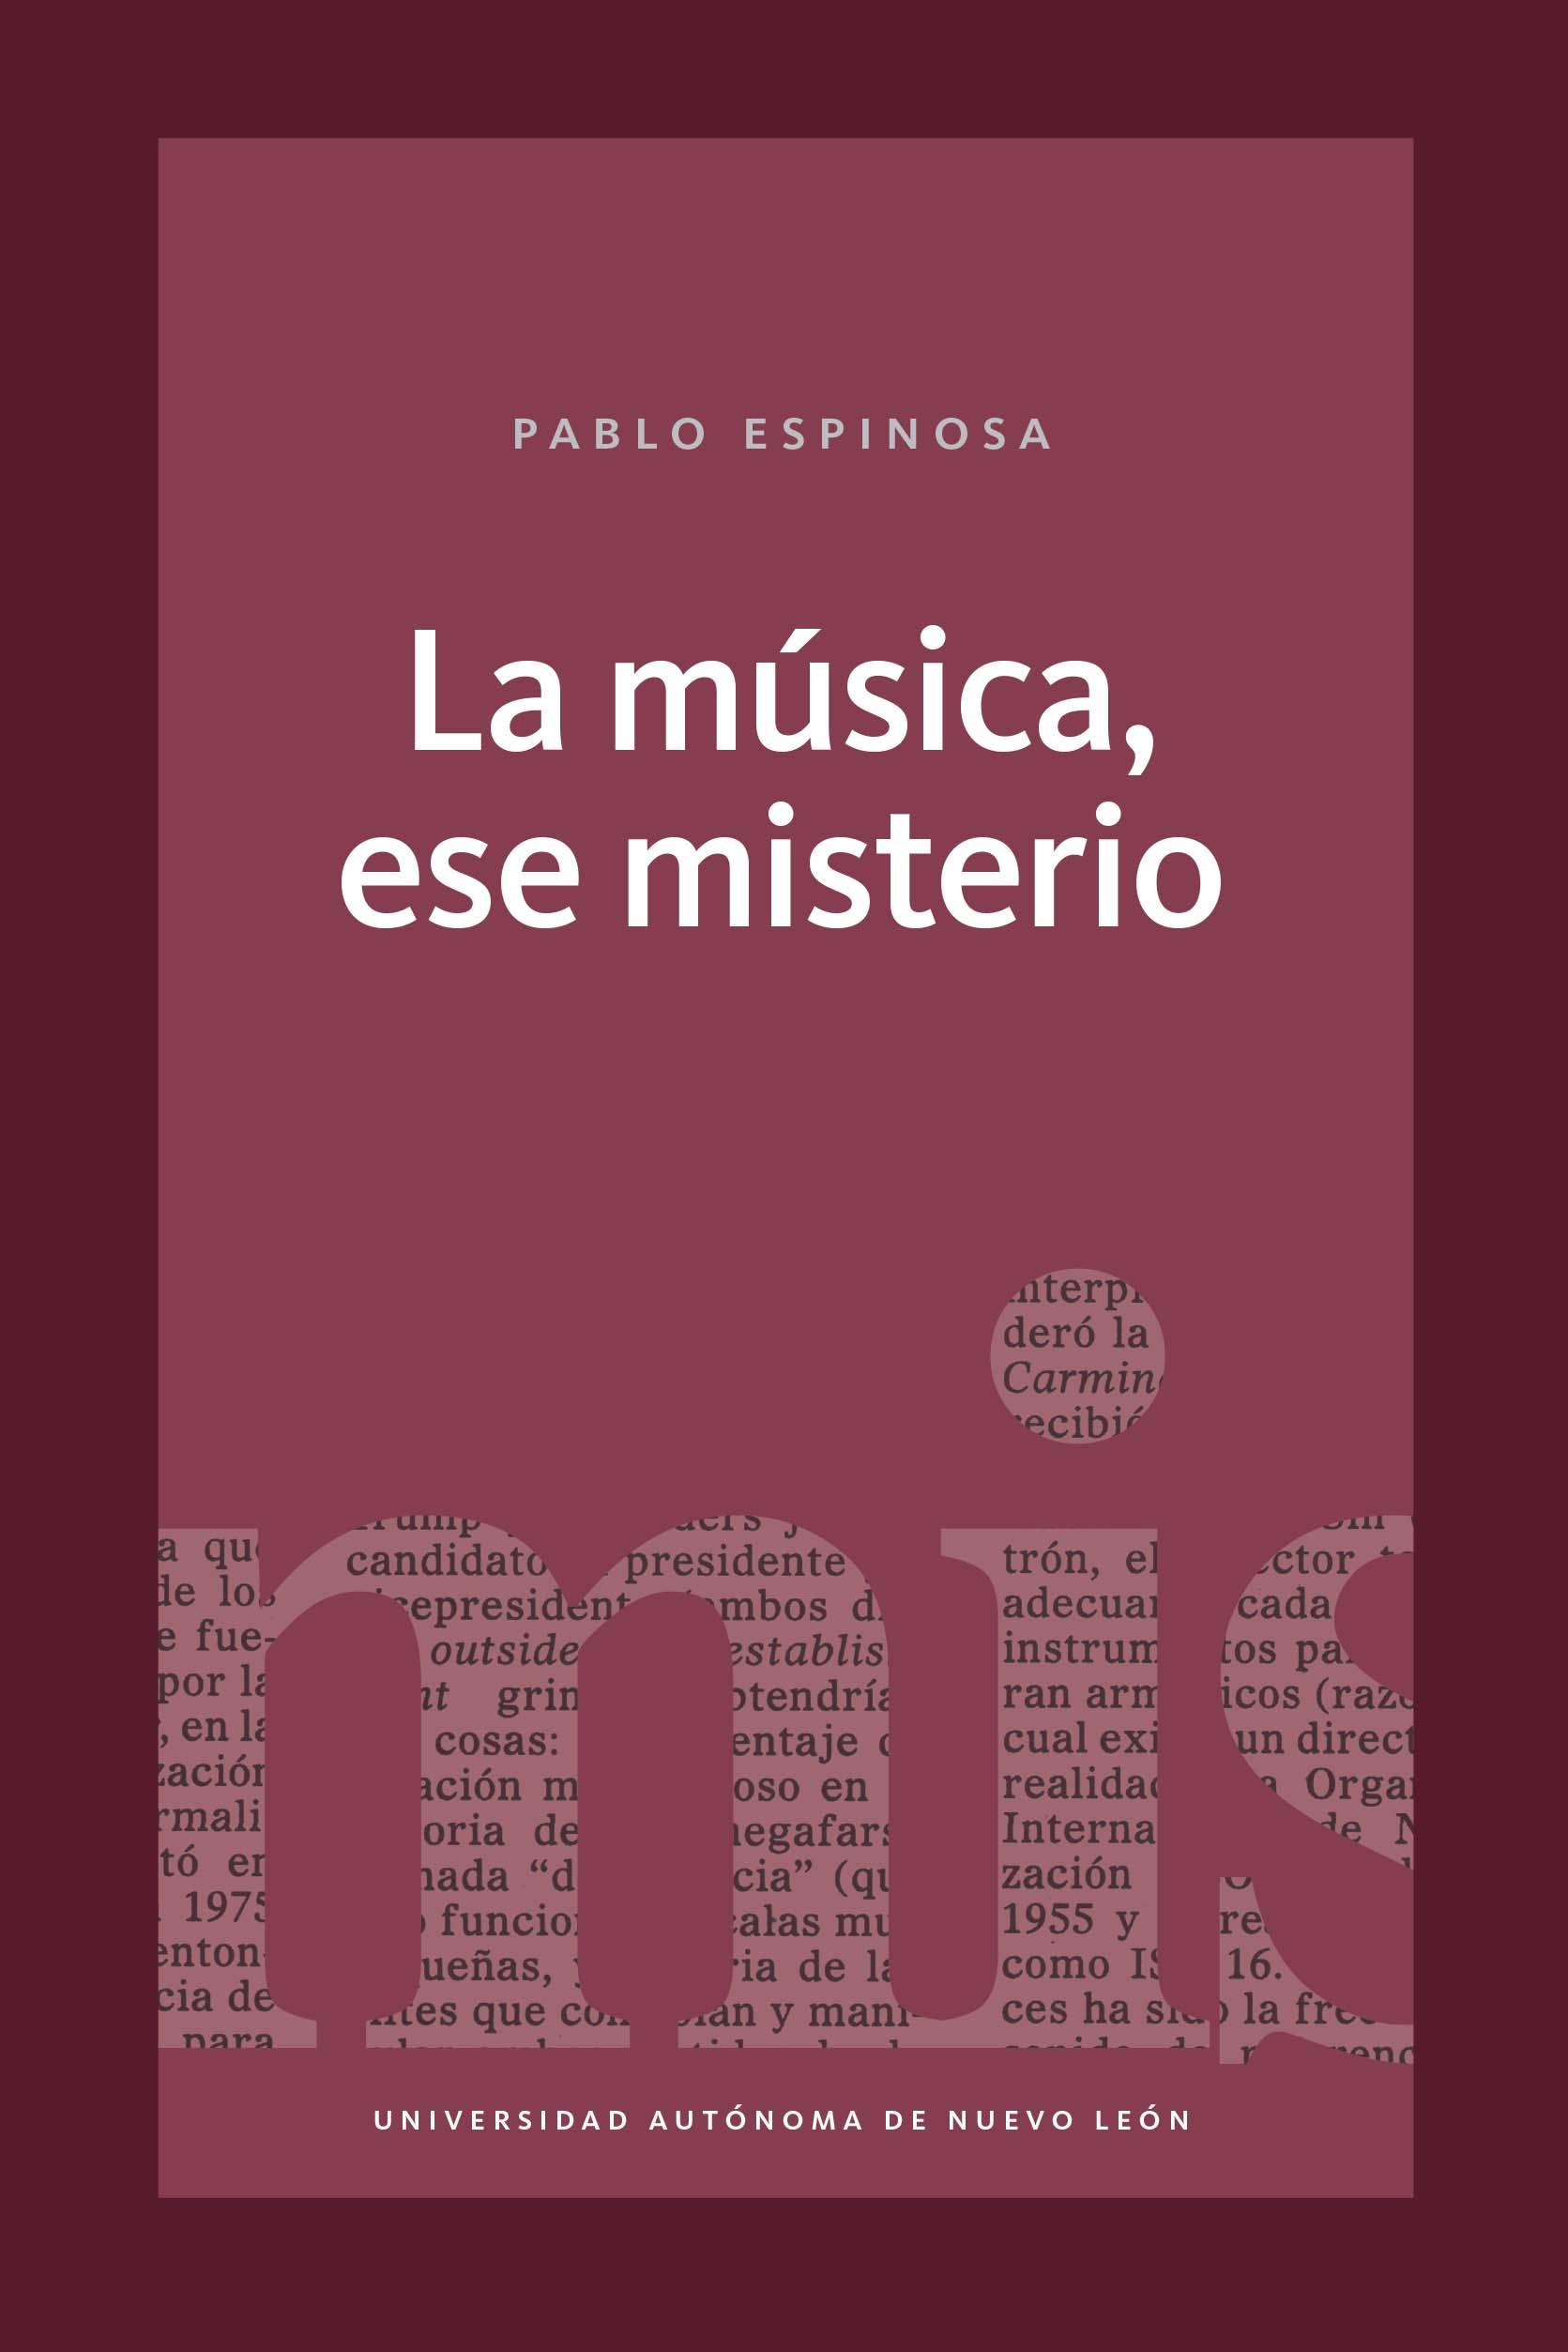 La música, ese misterio